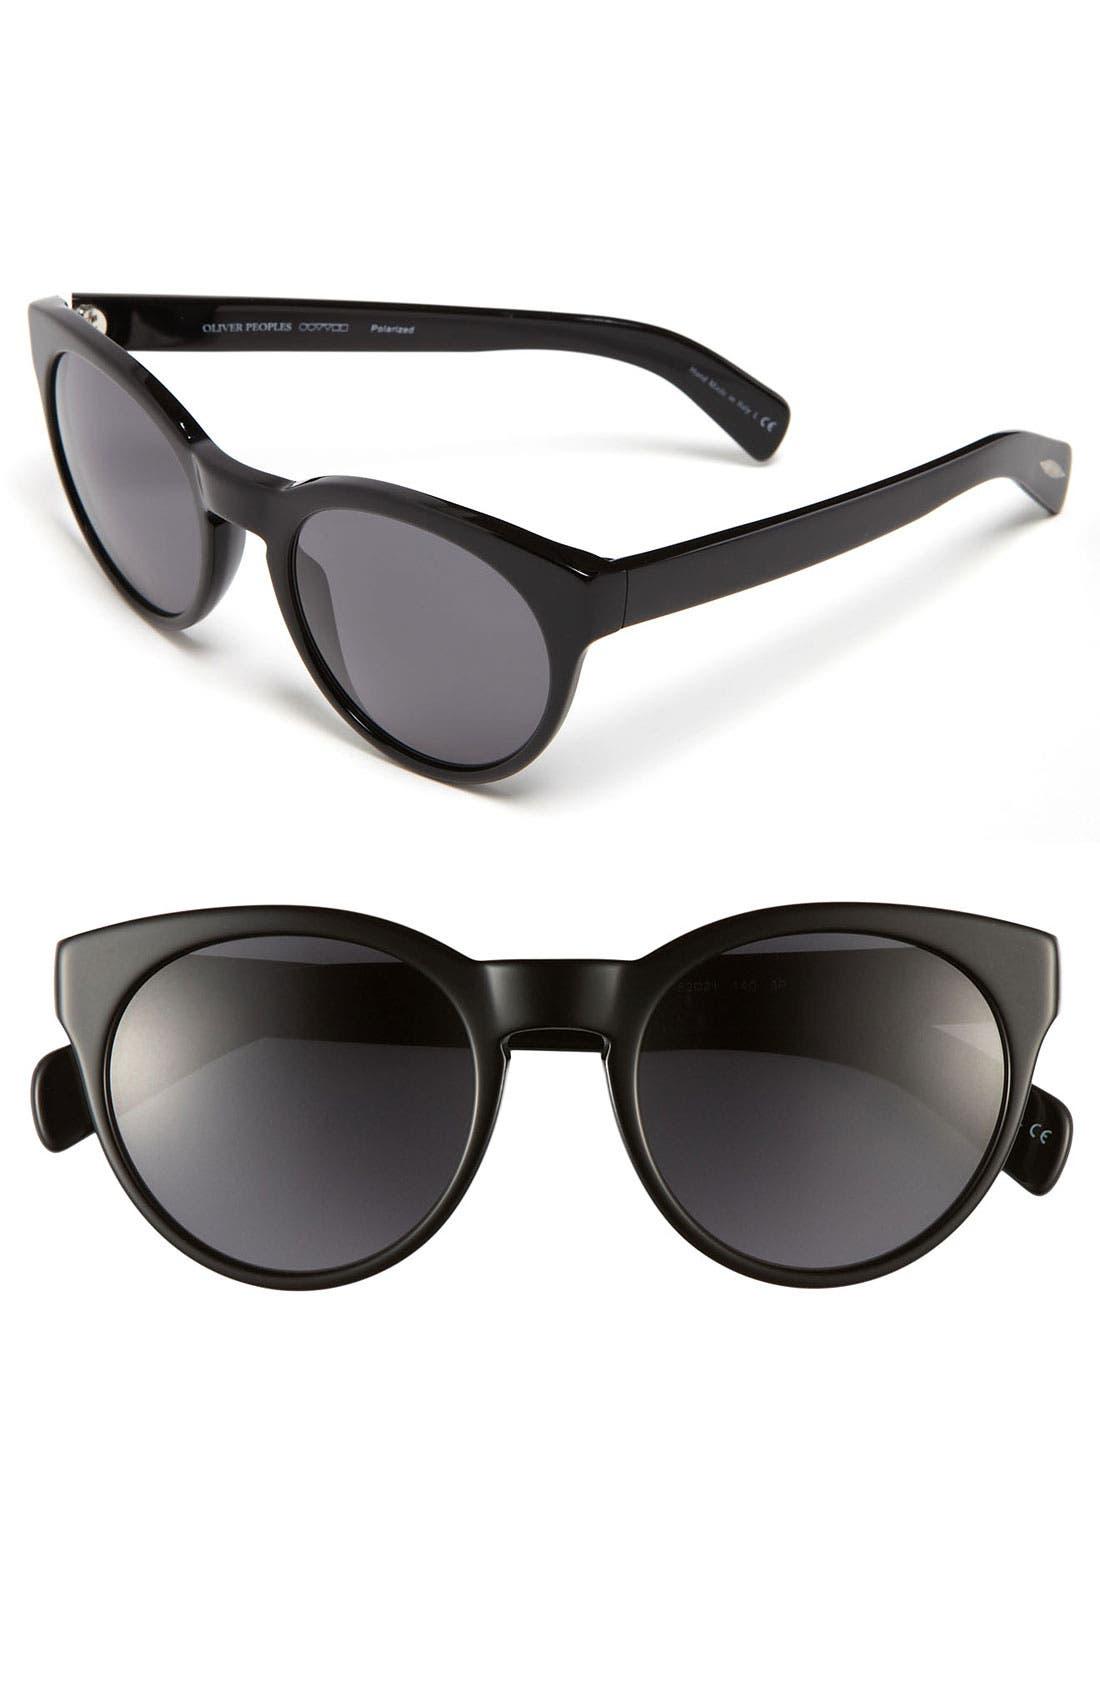 Main Image - Oliver Peoples 52mm Polarized Sunglasses